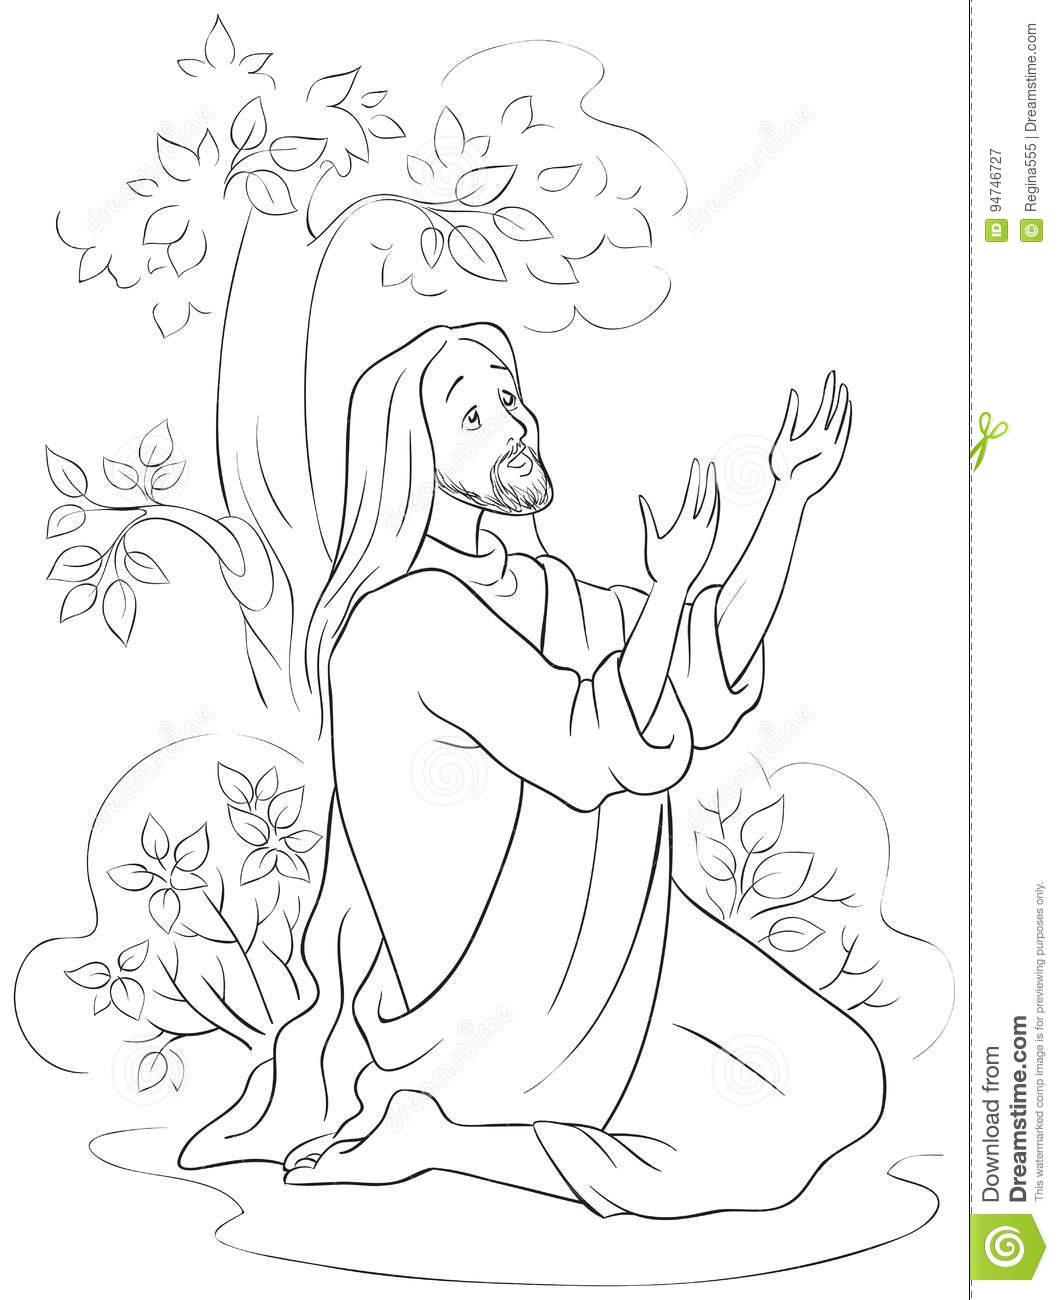 garden of gethsemane coloring pictures 8 best images about bible garden of gethsemane on pictures of gethsemane garden coloring